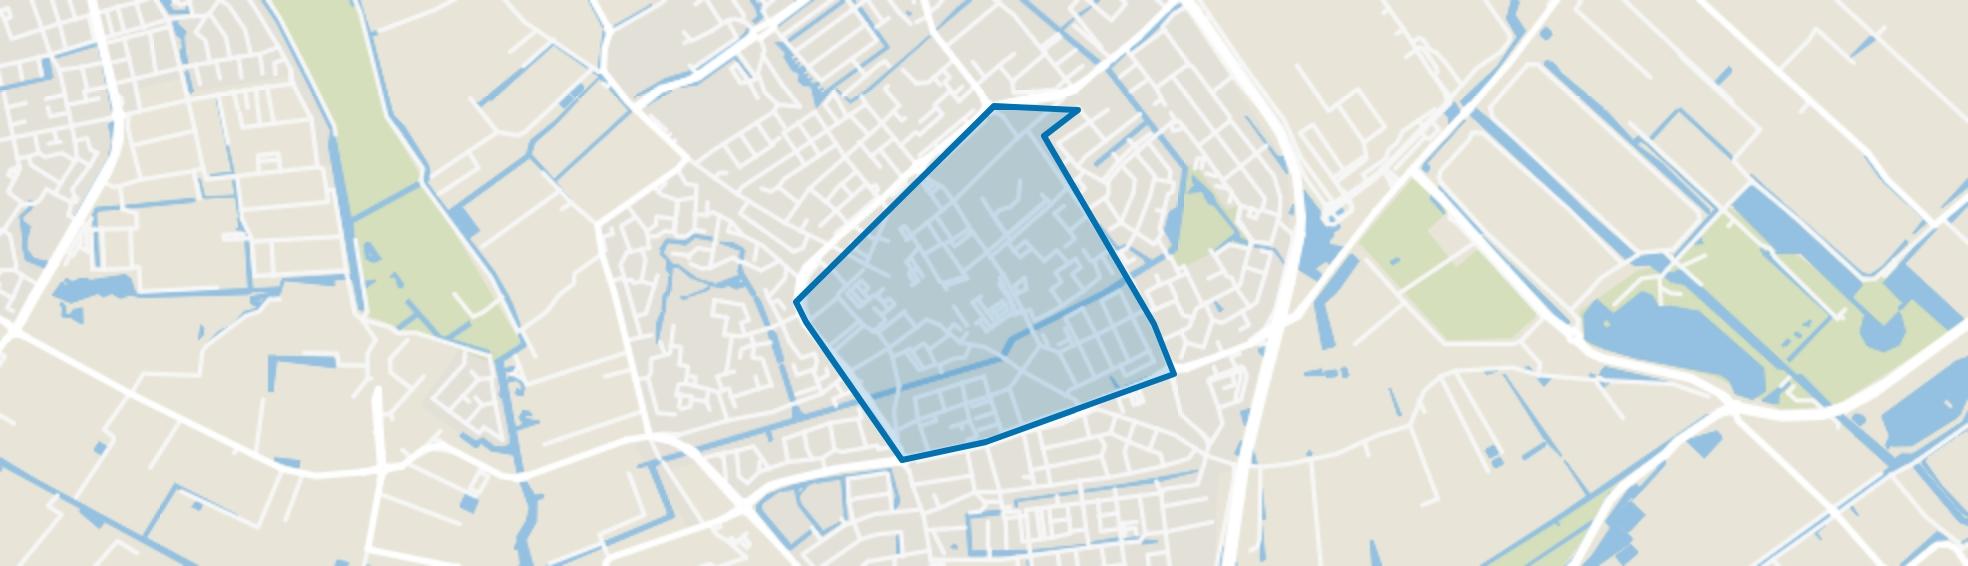 Naaldwijk Centrumgebied, Naaldwijk map